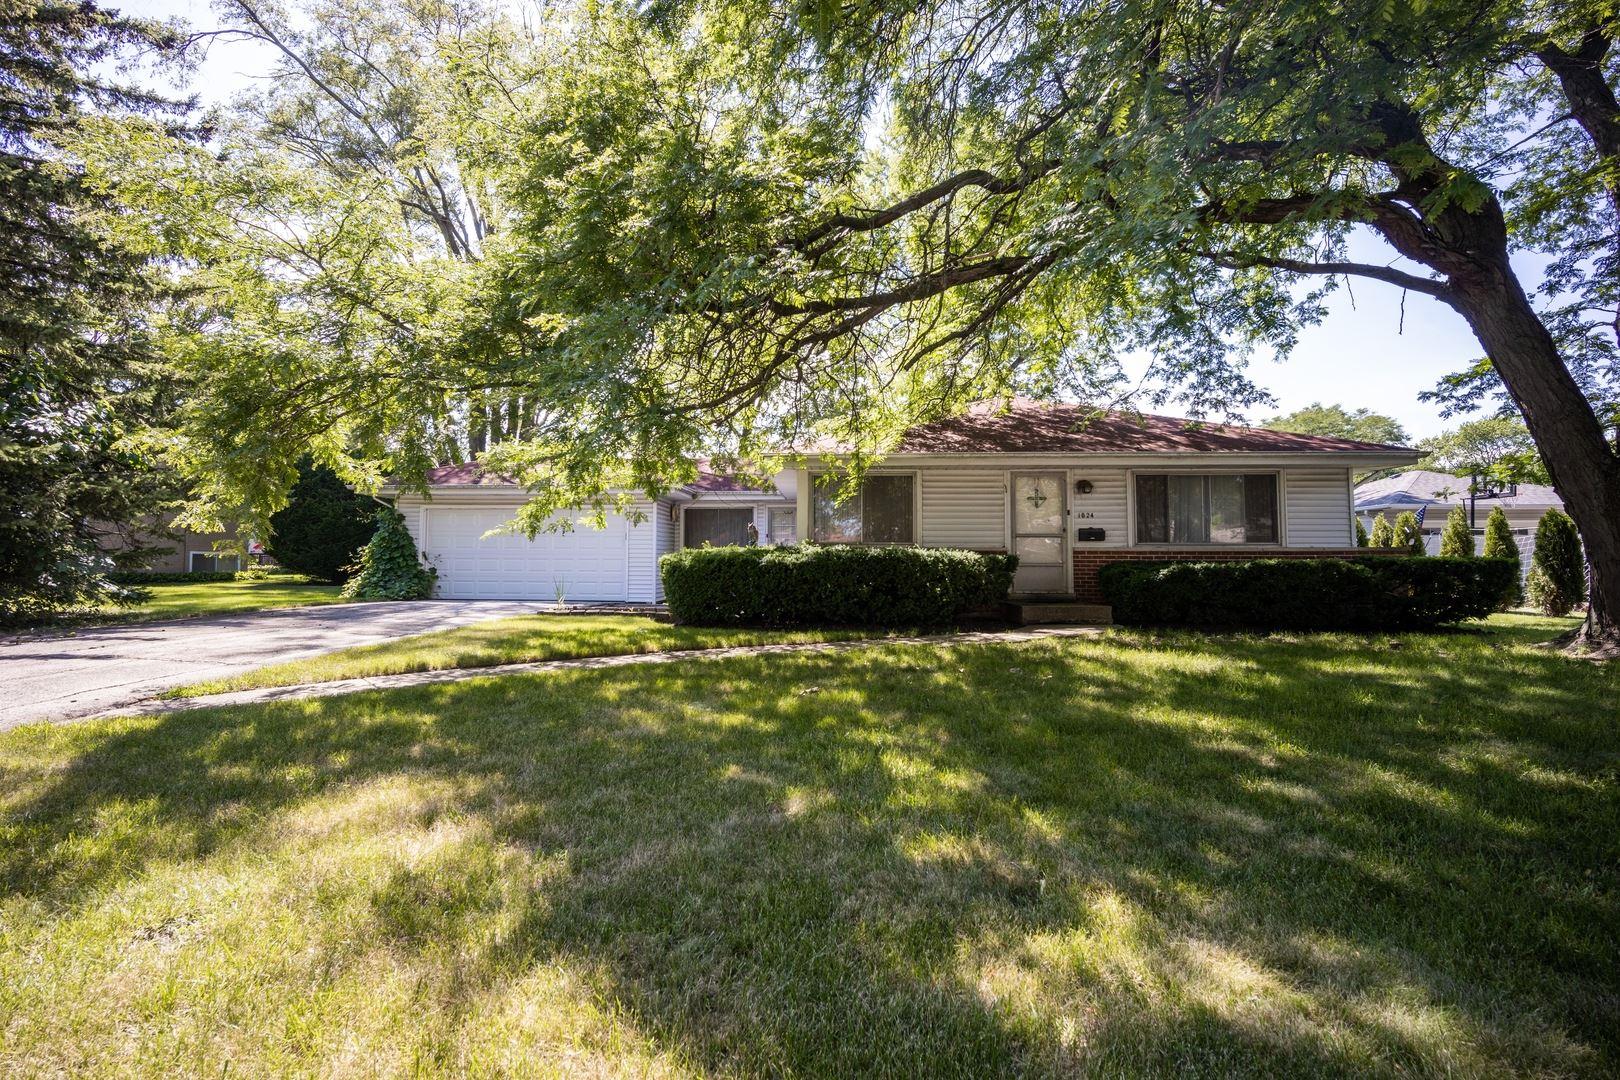 1024 Huber Lane, Glenview, IL 60025 - #: 10785451